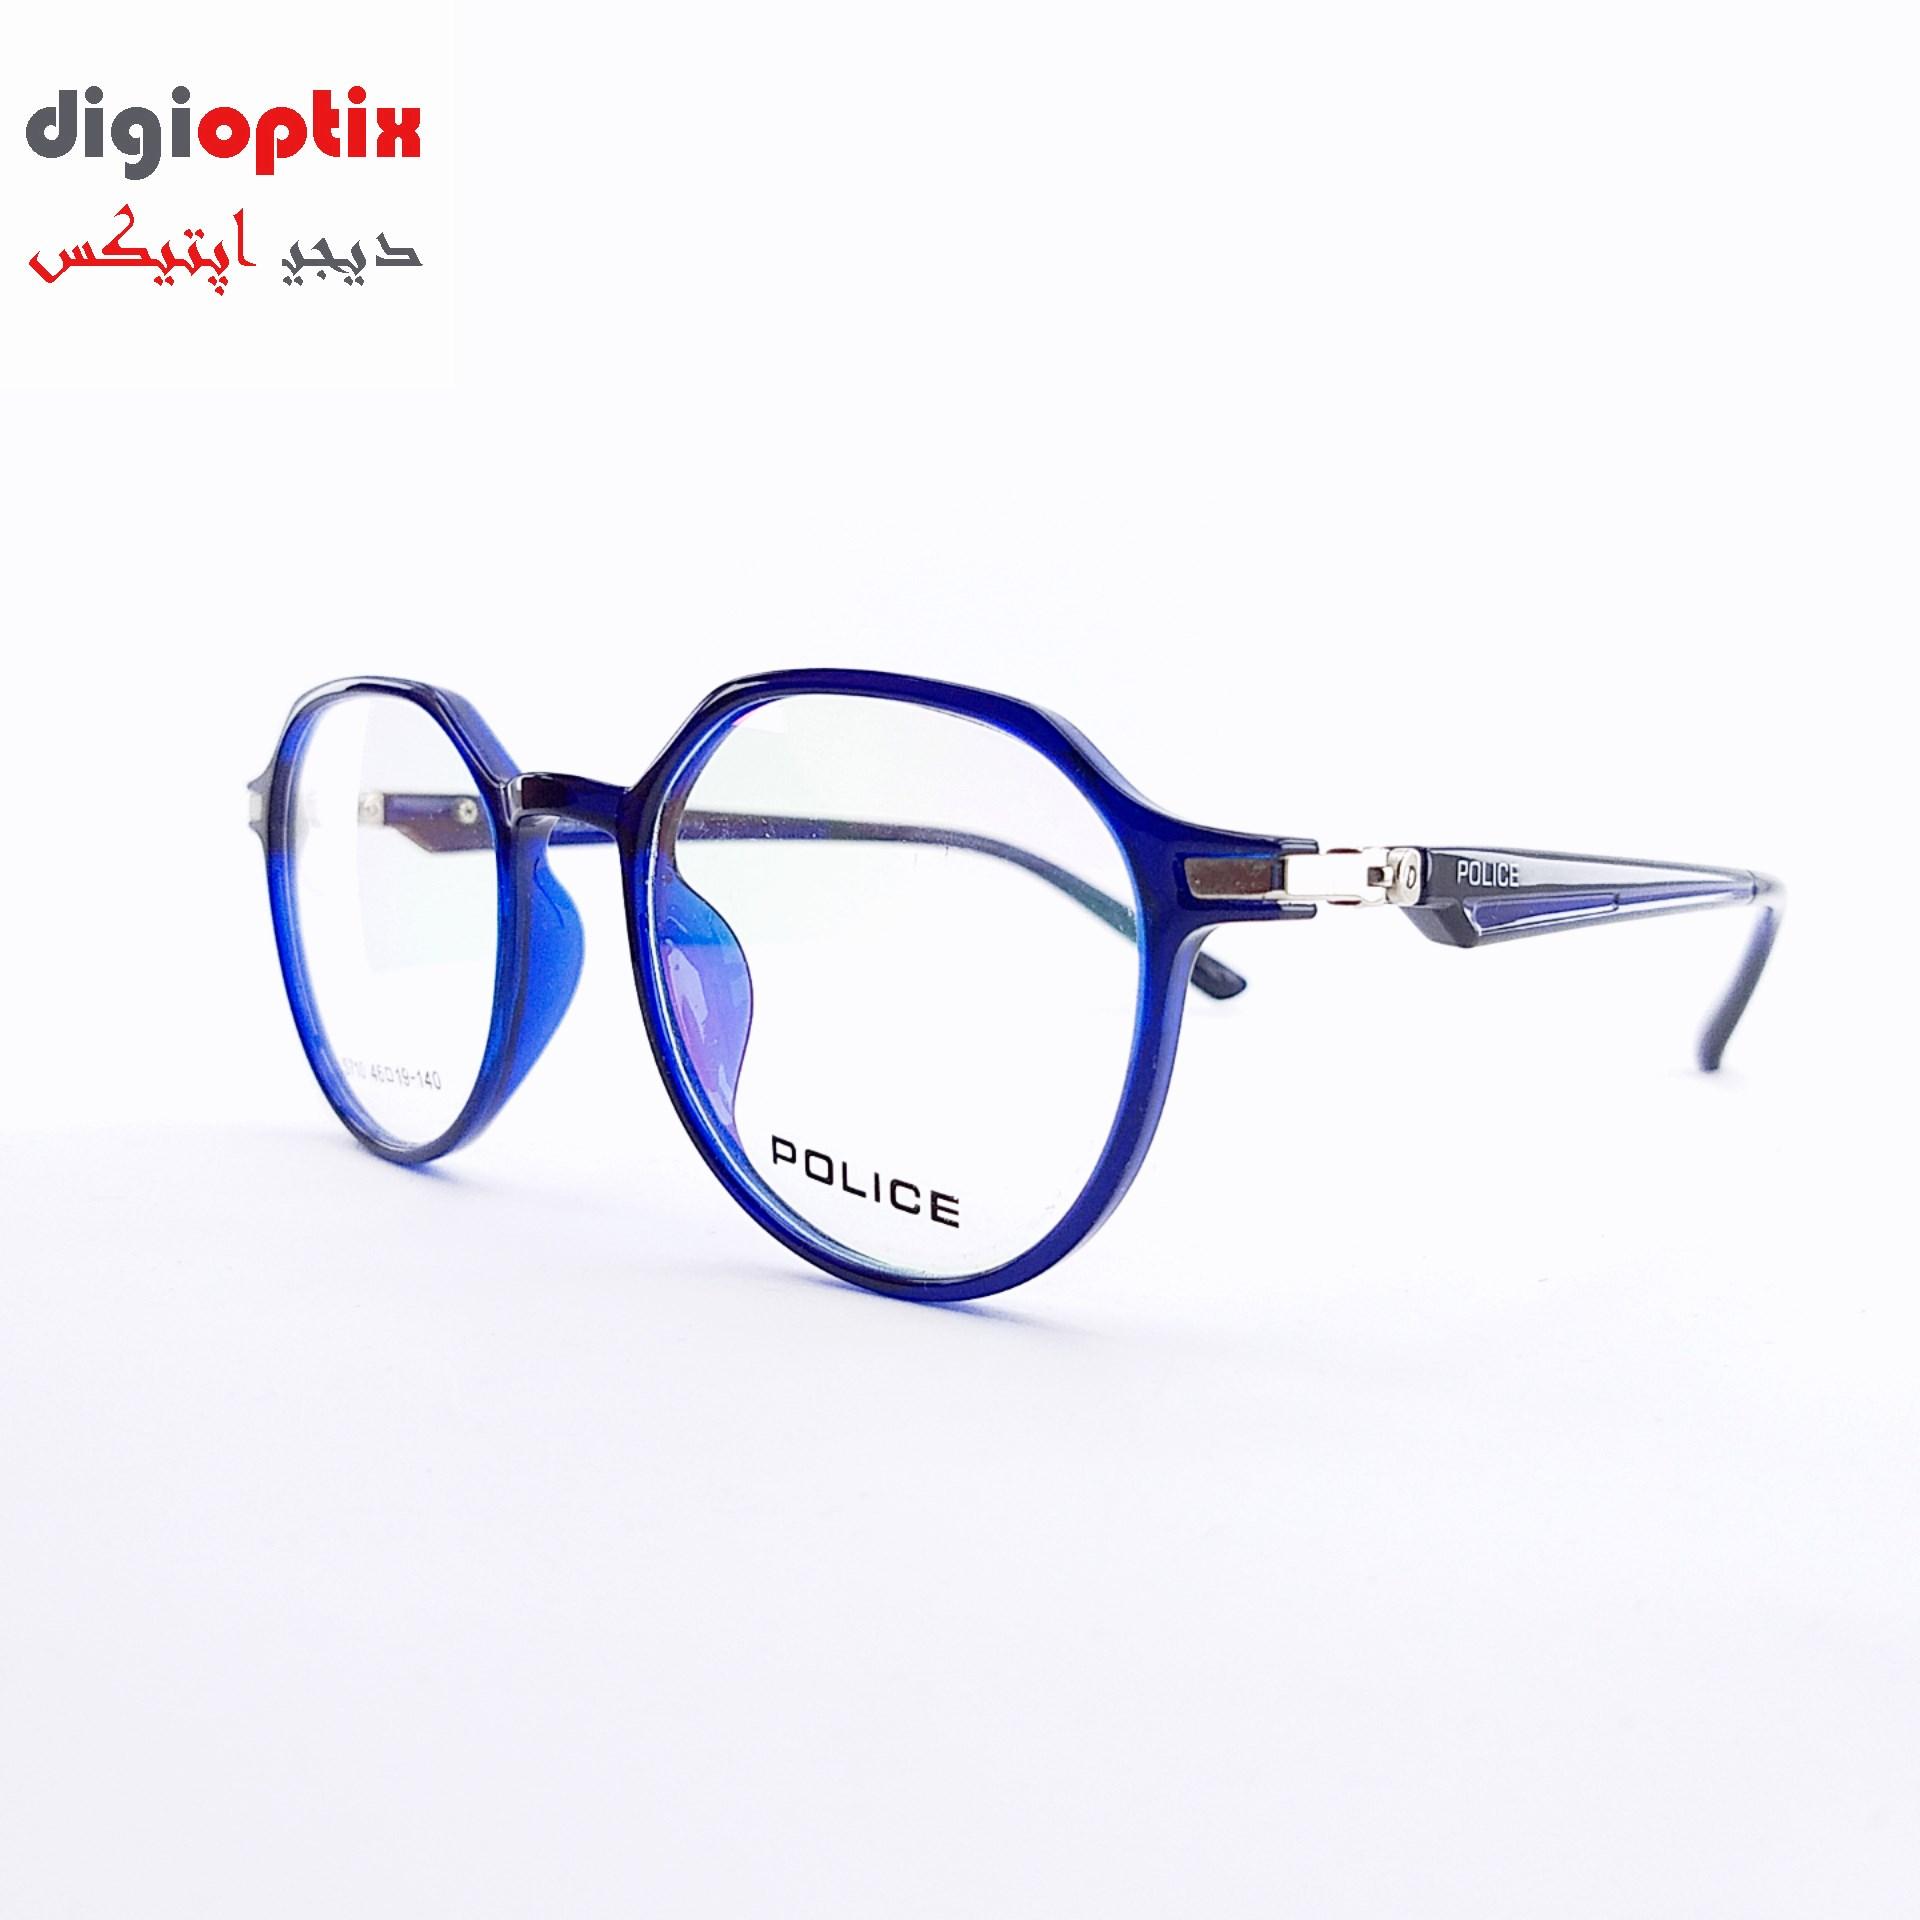 فریم عینک طبی مارک POLICE رنگ آبی مدل S-710